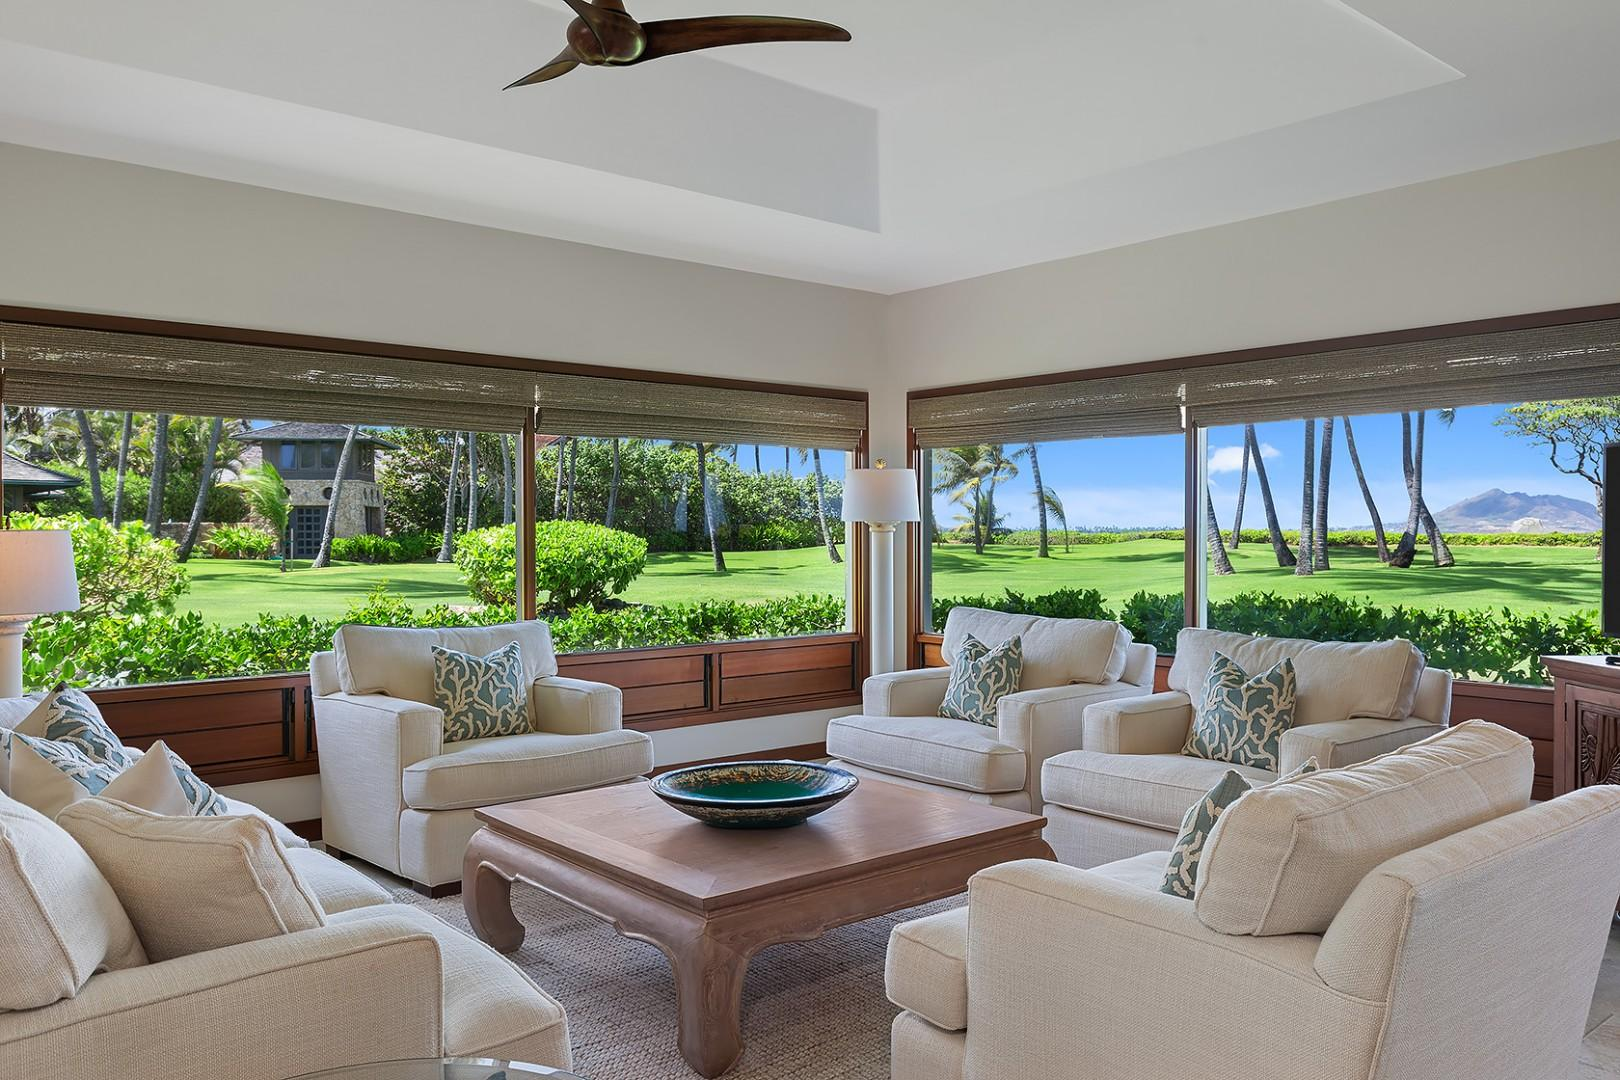 Beach House - Formal Living